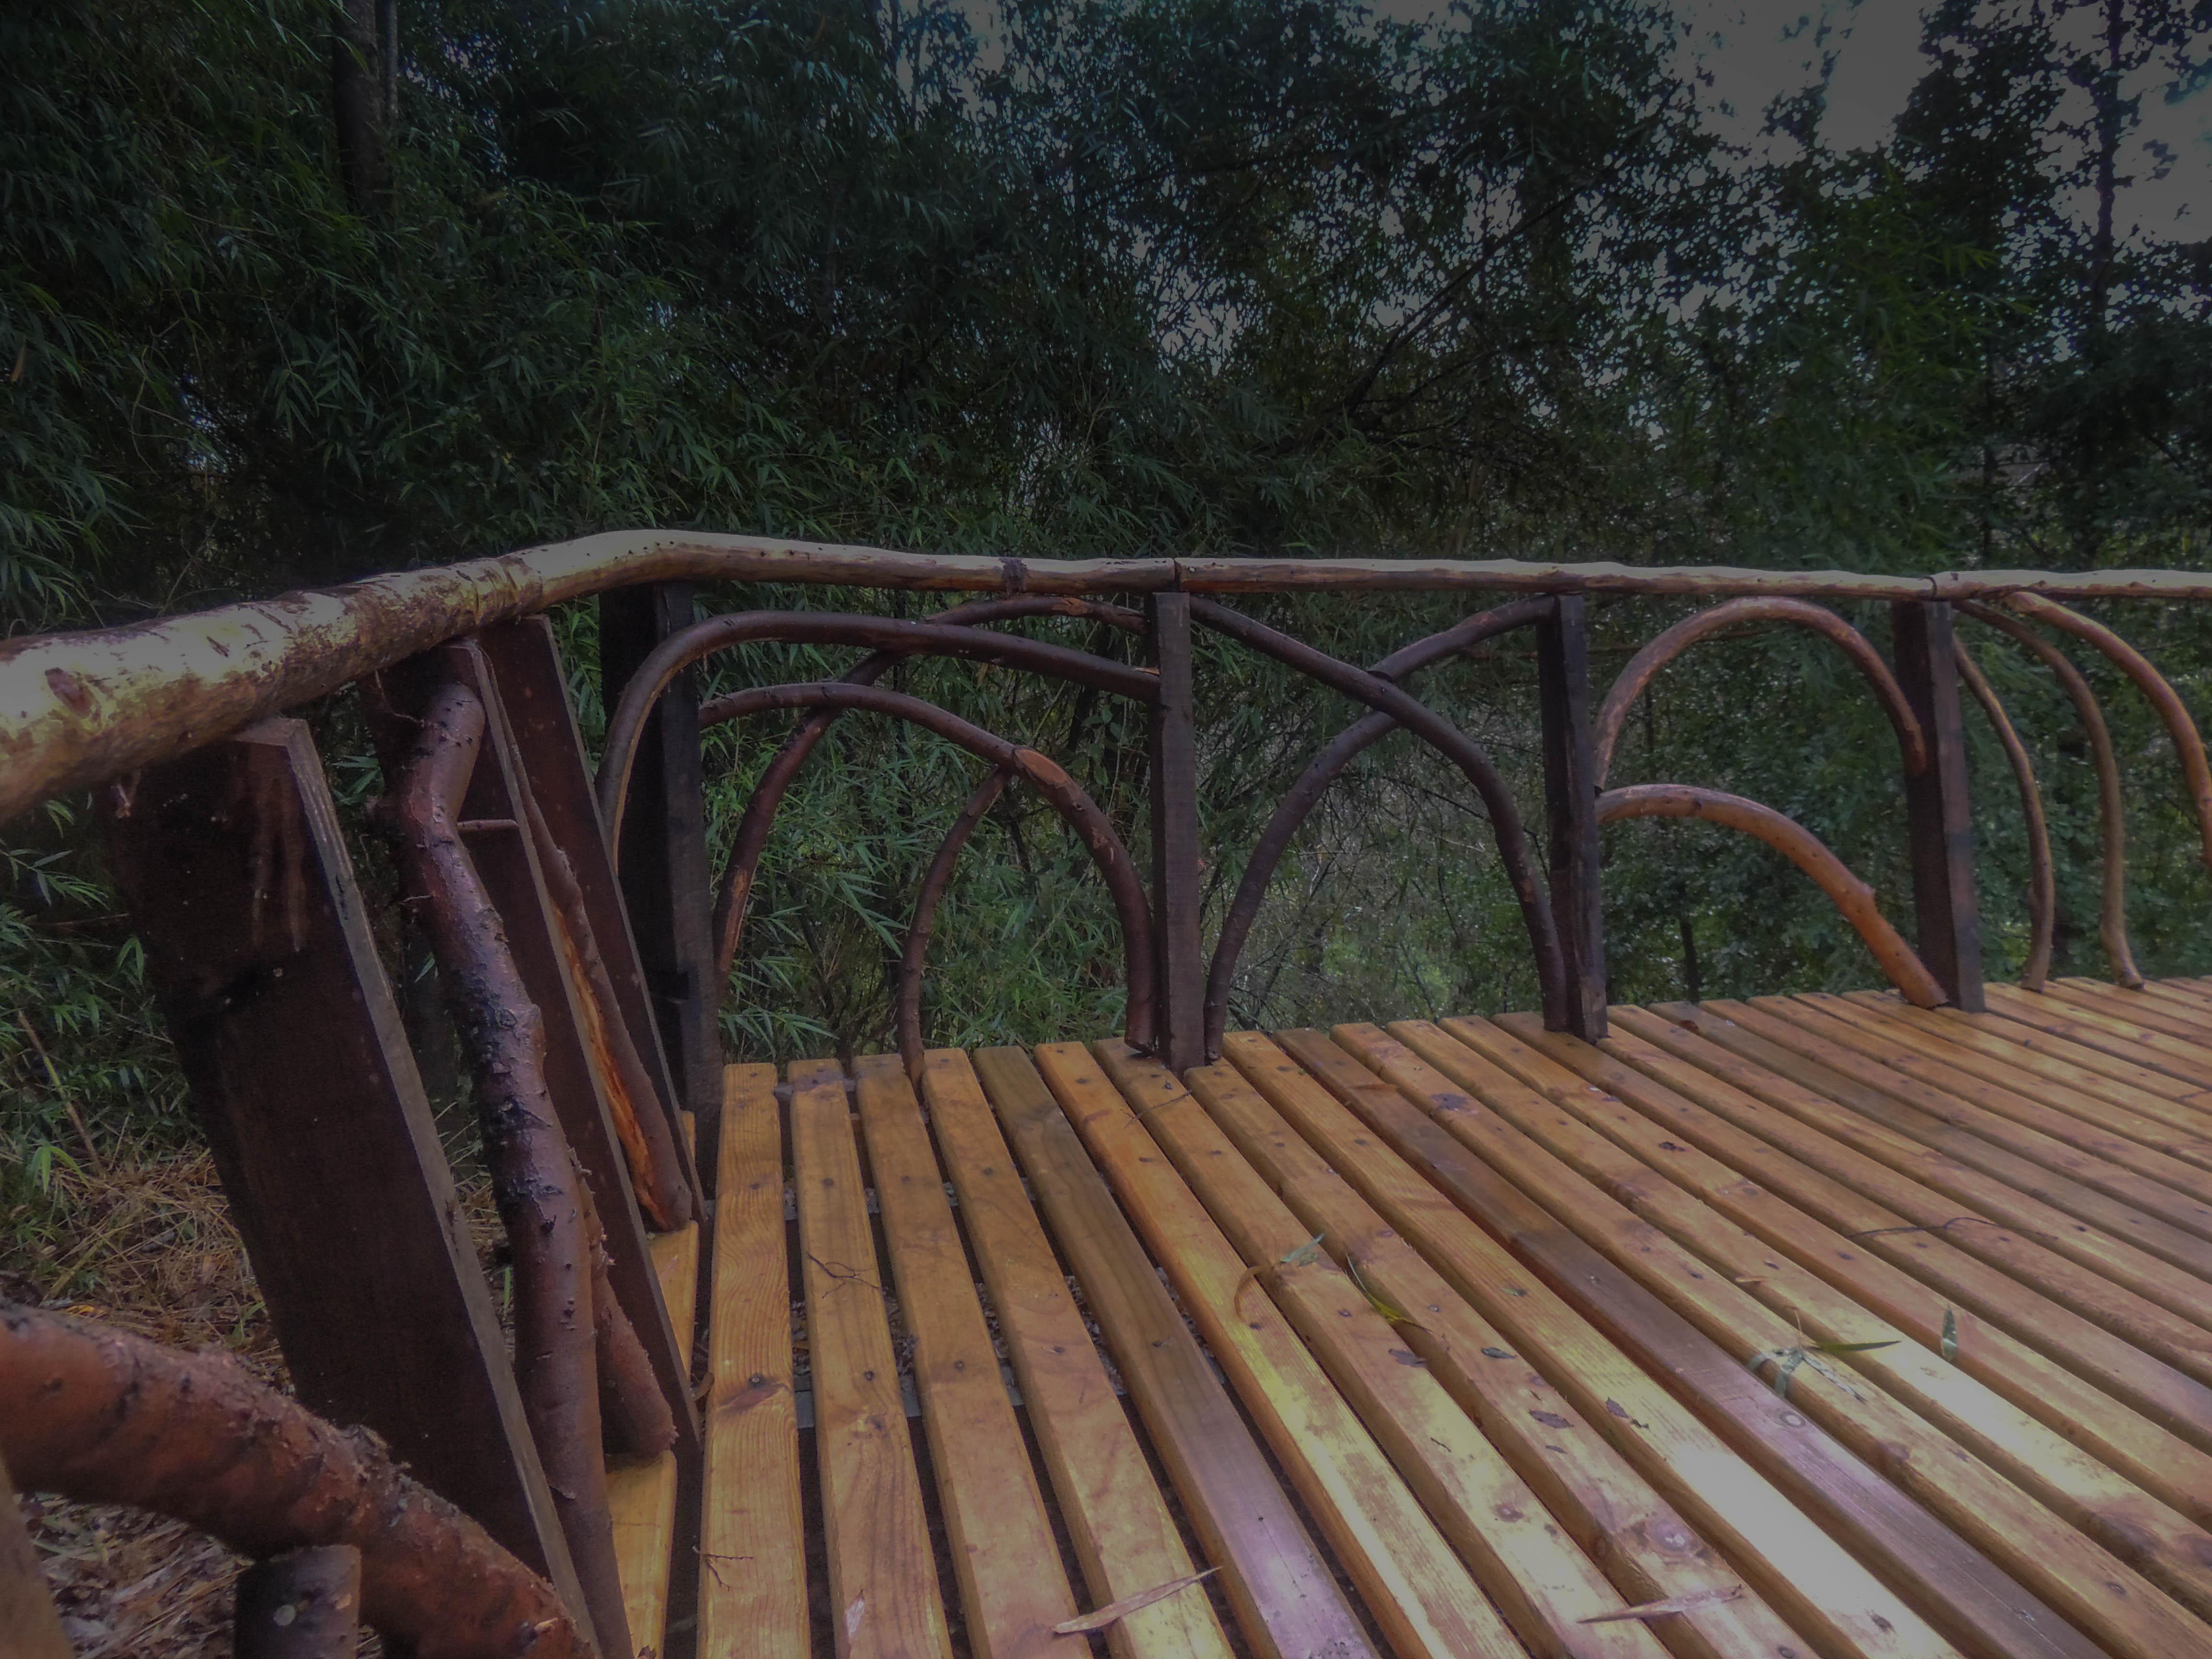 #diseño_#jardines_#futrono_#patagonia_#surdechile_#lagoranco_(11)